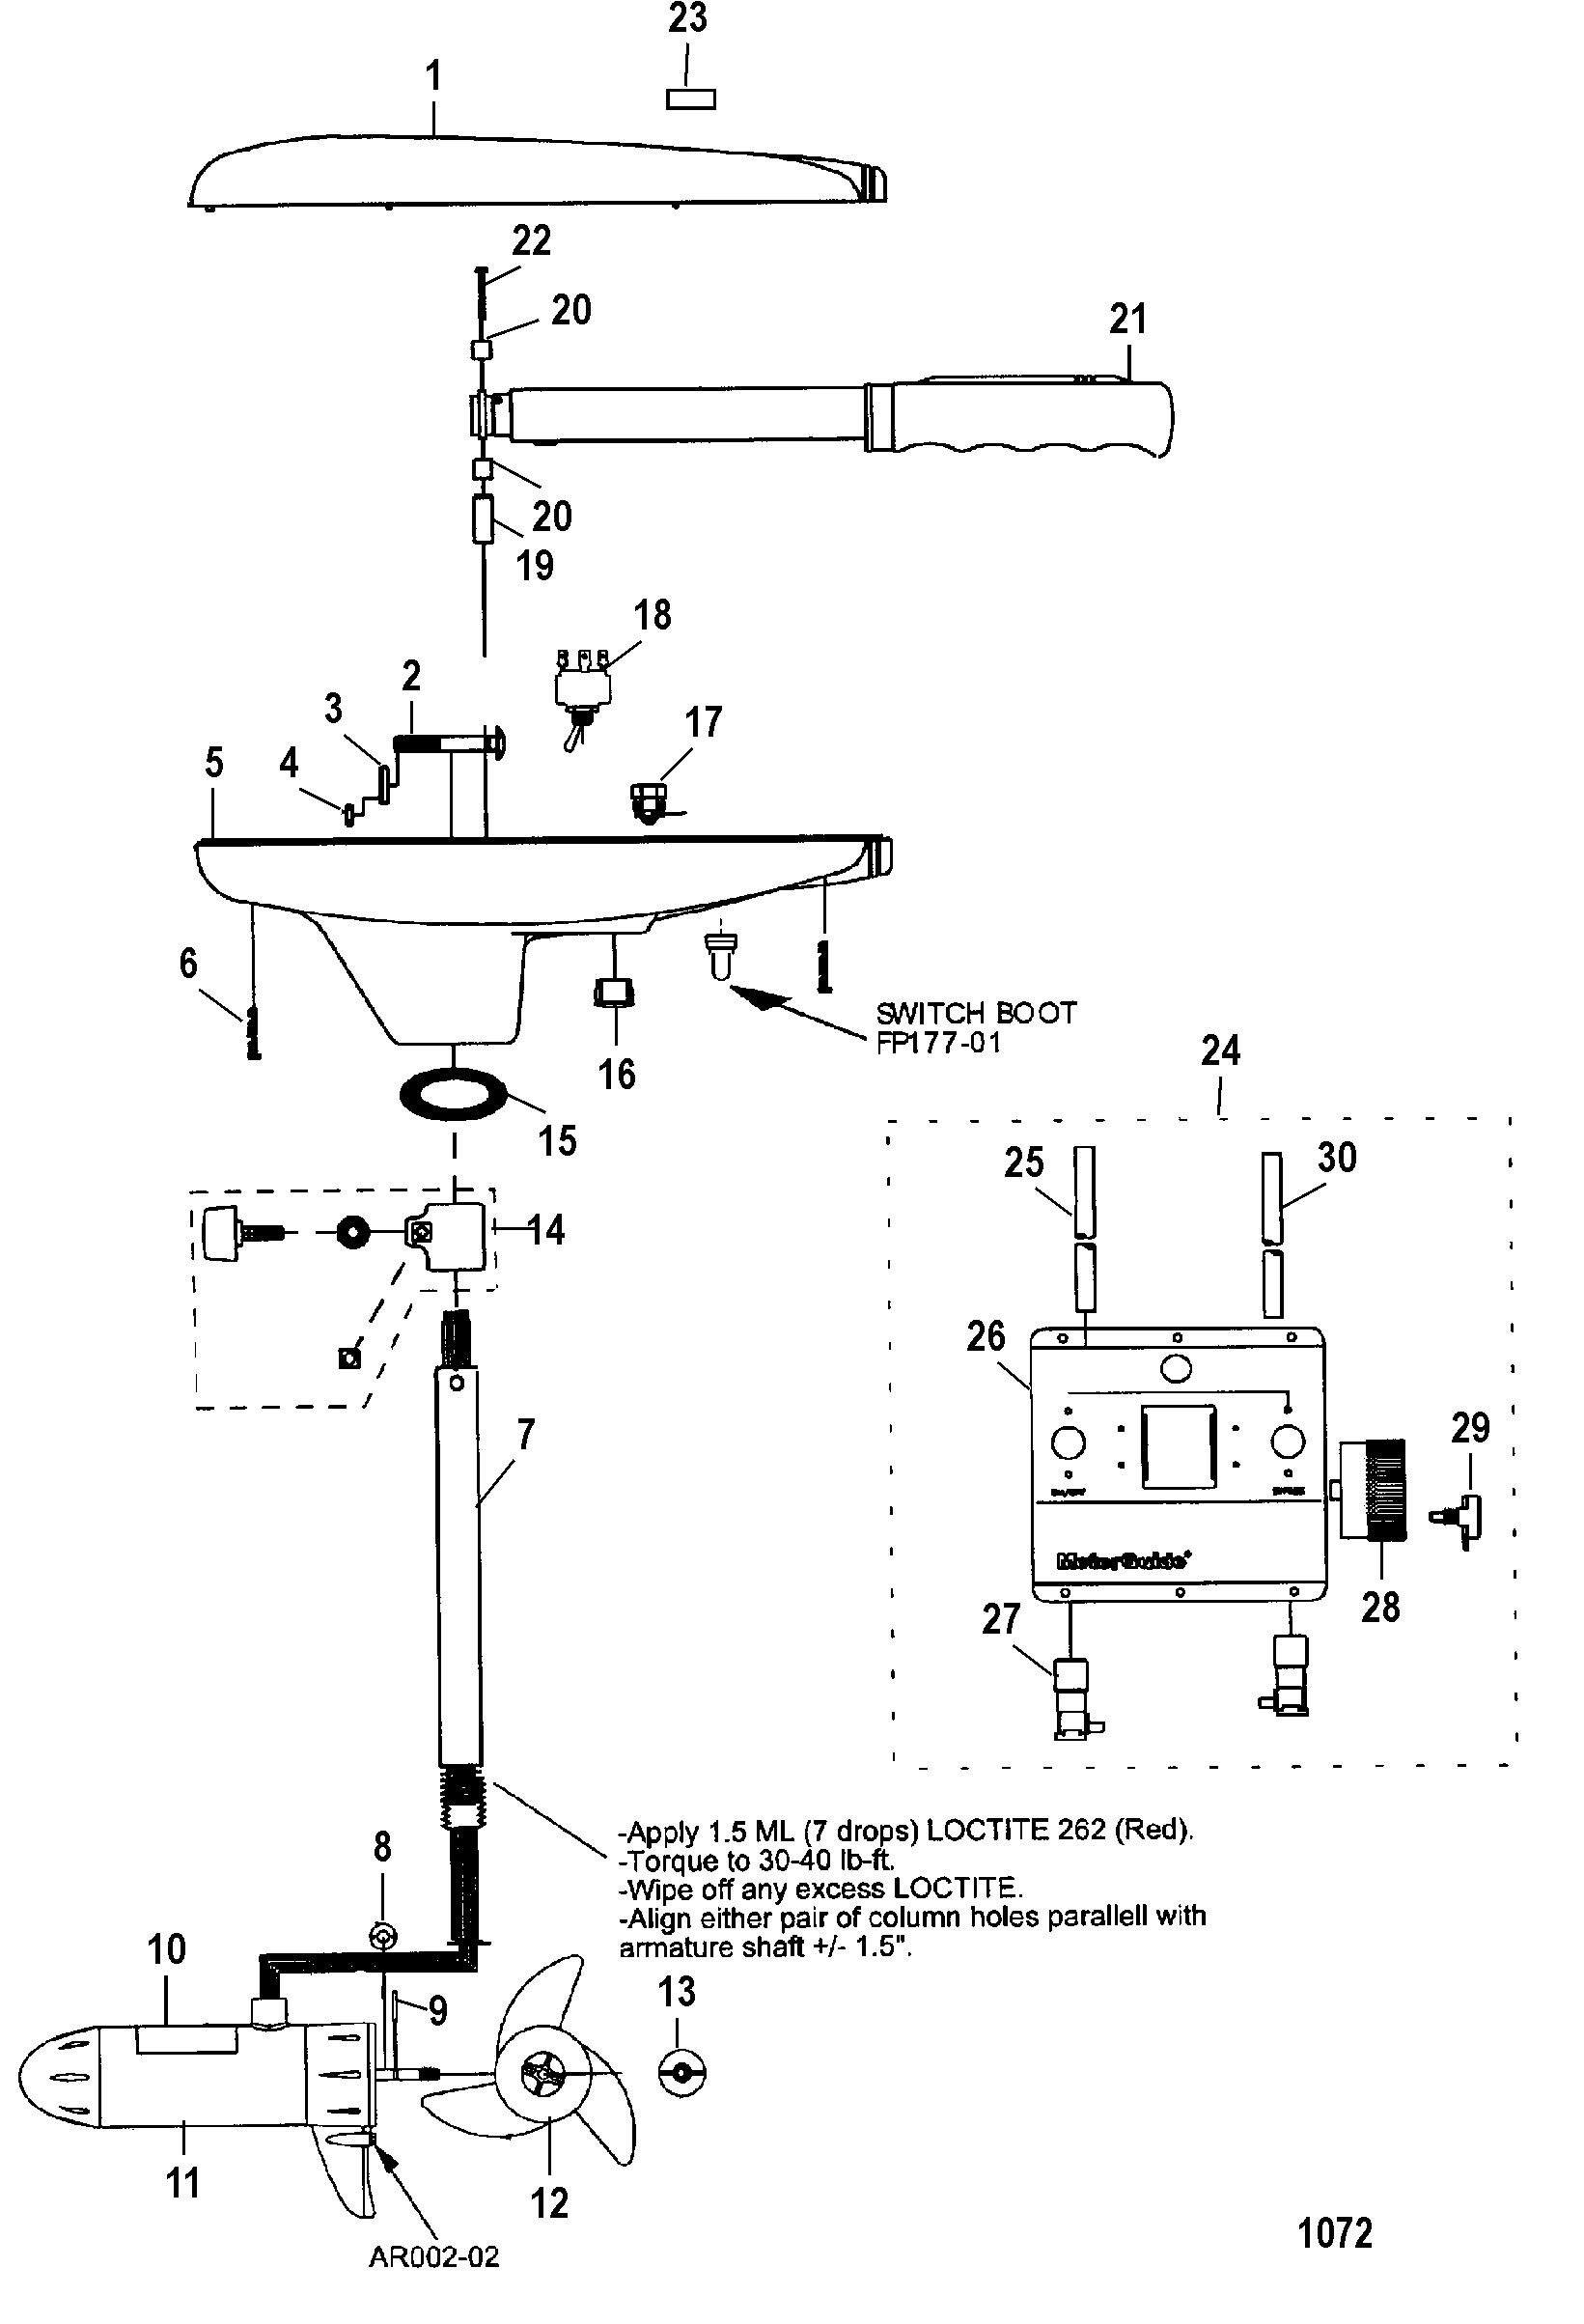 Motorguide 24 Volt Trolling Motor Wiring Diagram - 24 Volt Trolling Motor Wiring Diagram